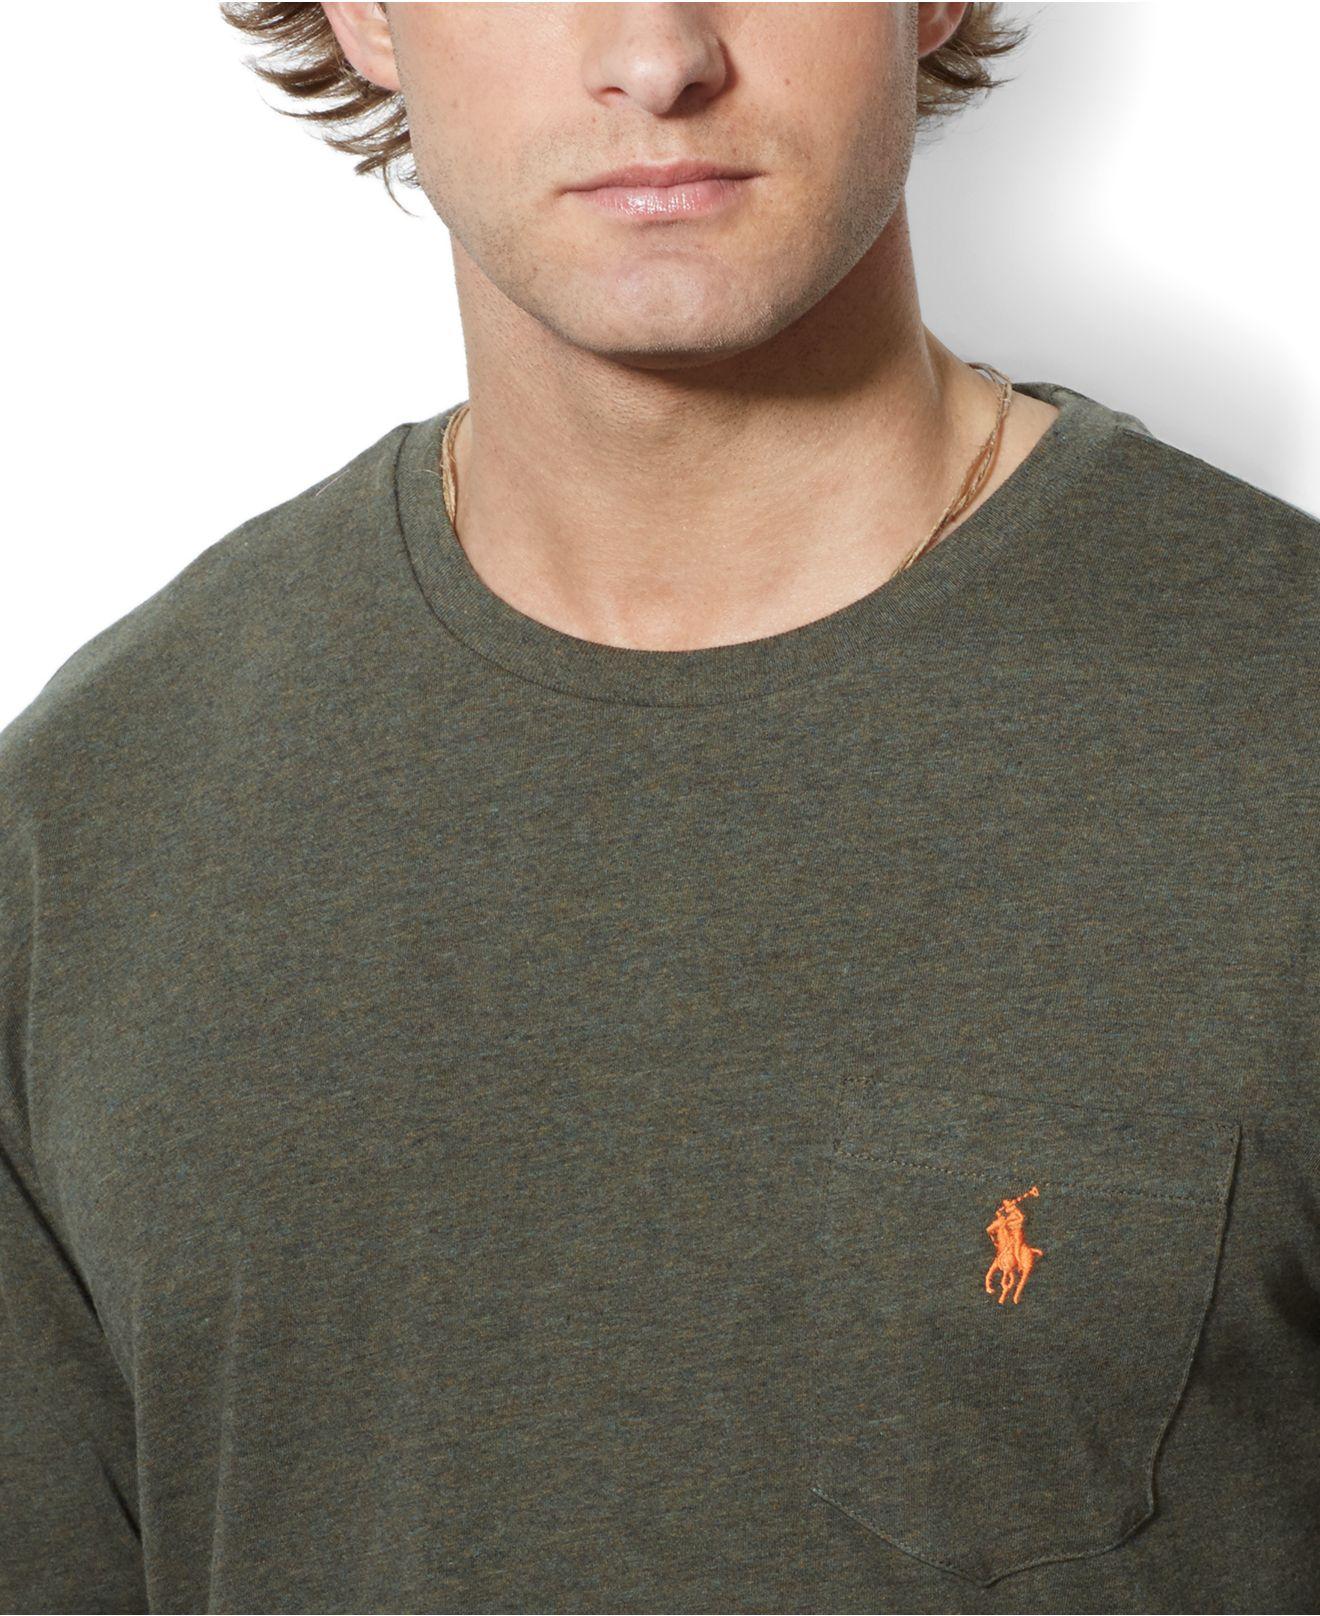 Shirt Ralph Date Sleeve Long Release Polo 09dad Lauren Pocket 81b3b LA543Rjq